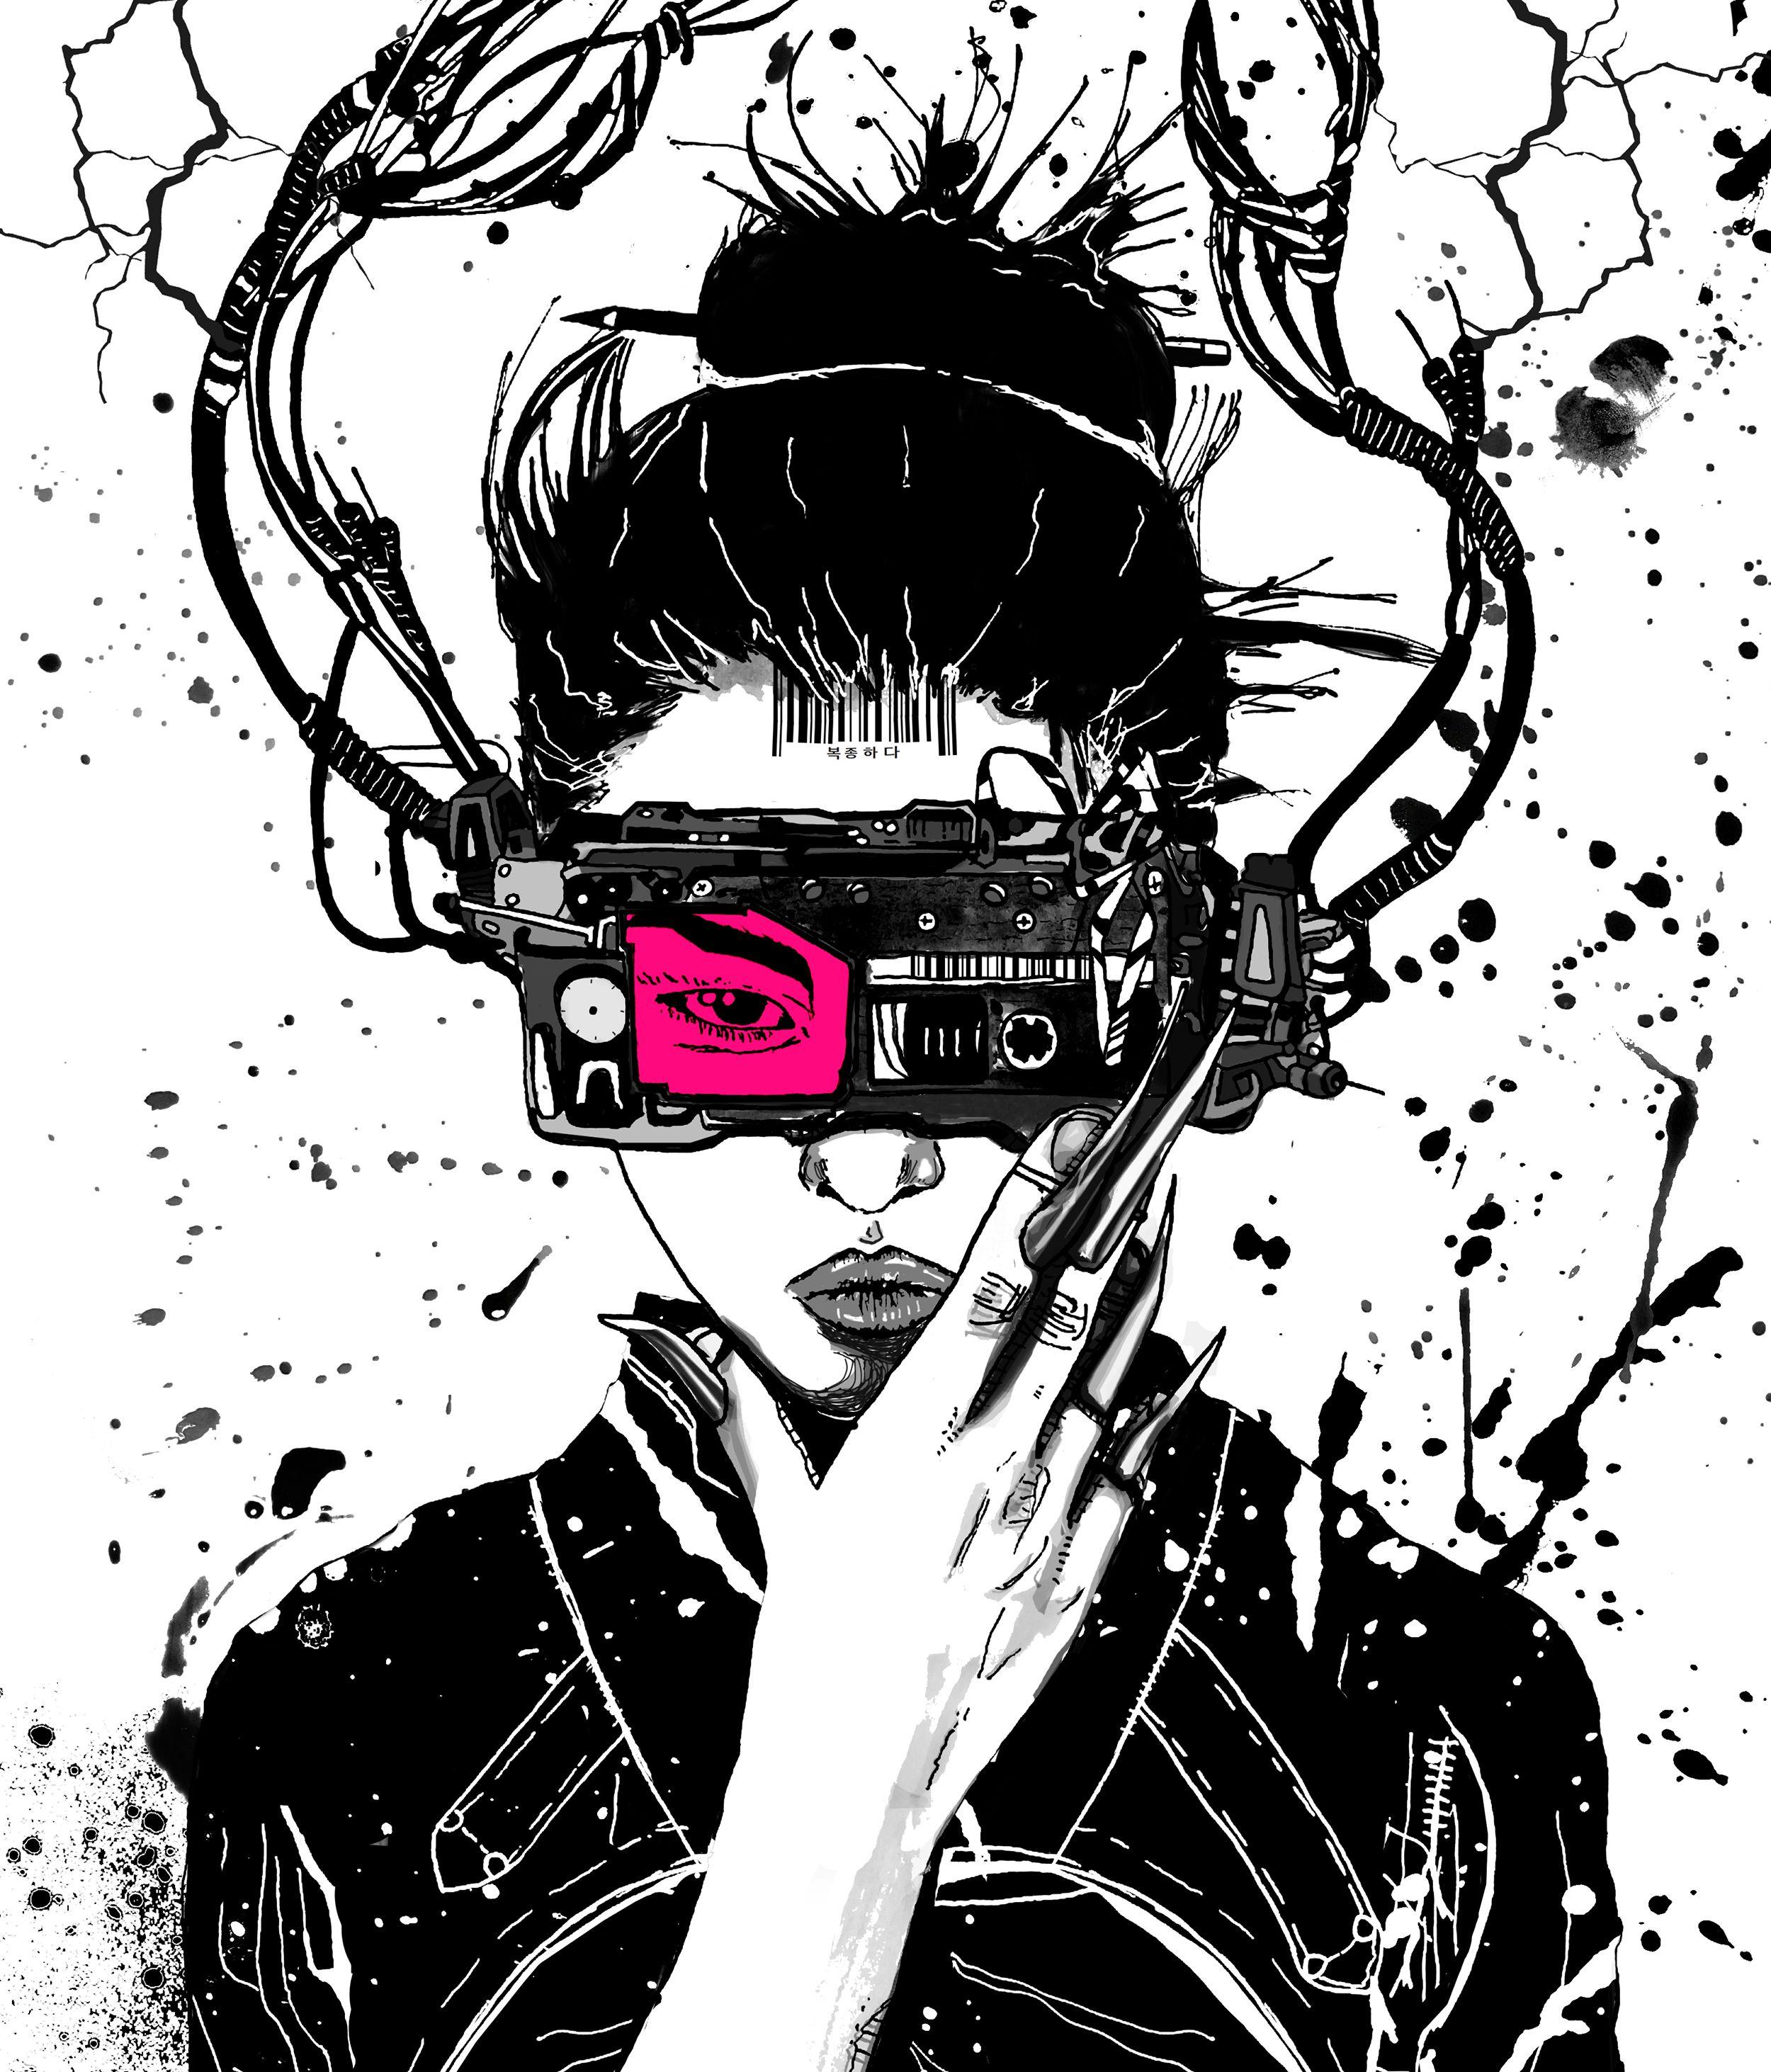 Cyberpunk Art Print Poster Etsy Cyberpunk Art Posters Art Prints Poster Prints